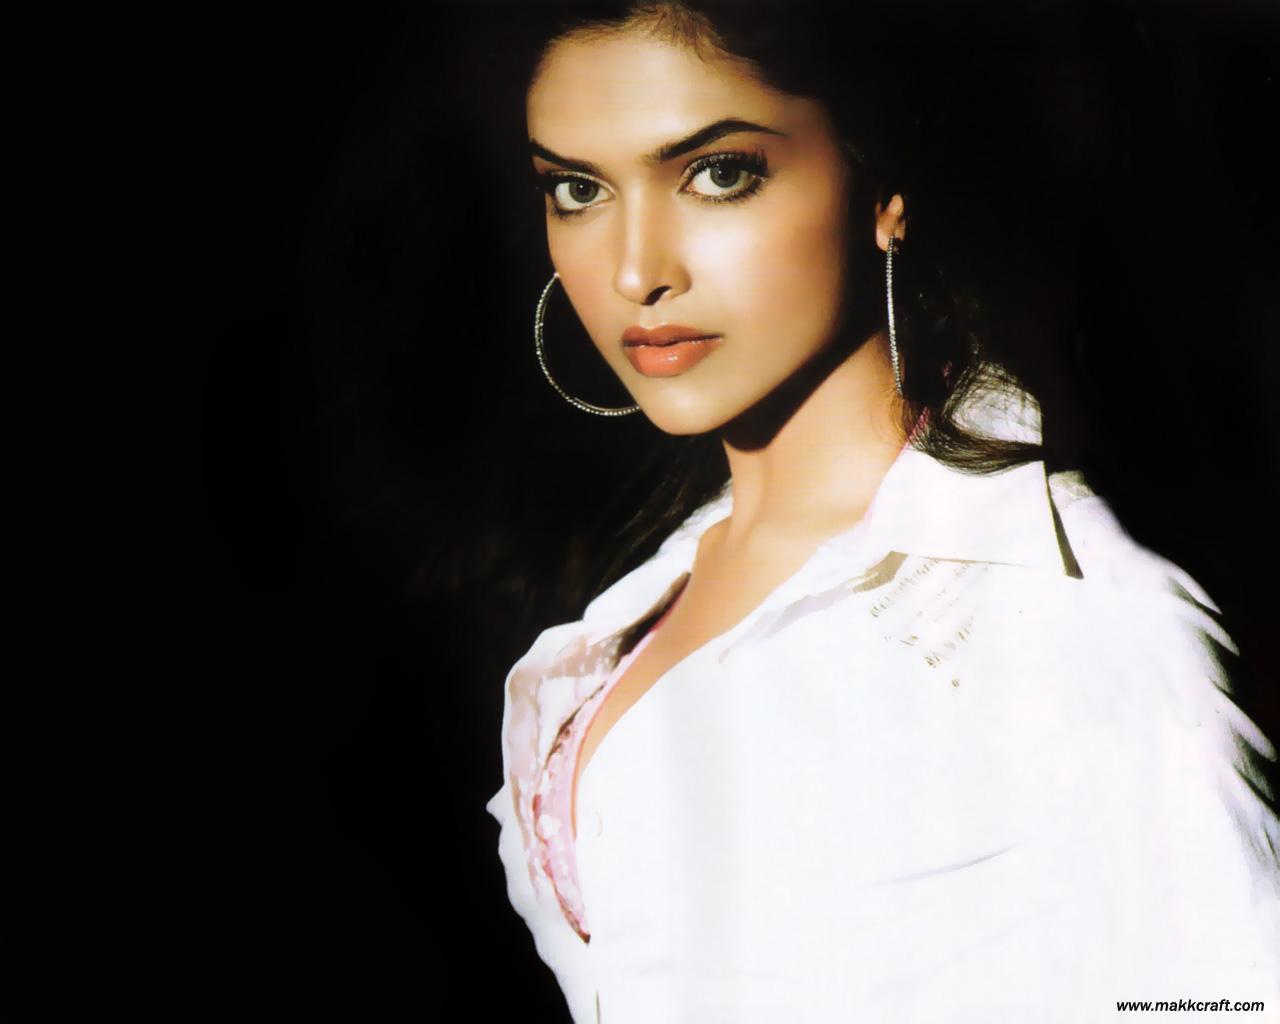 Deepika Padukone Wallpapers: 2012-13 Deepika Padukone Hot ...  Deepika Padukon...